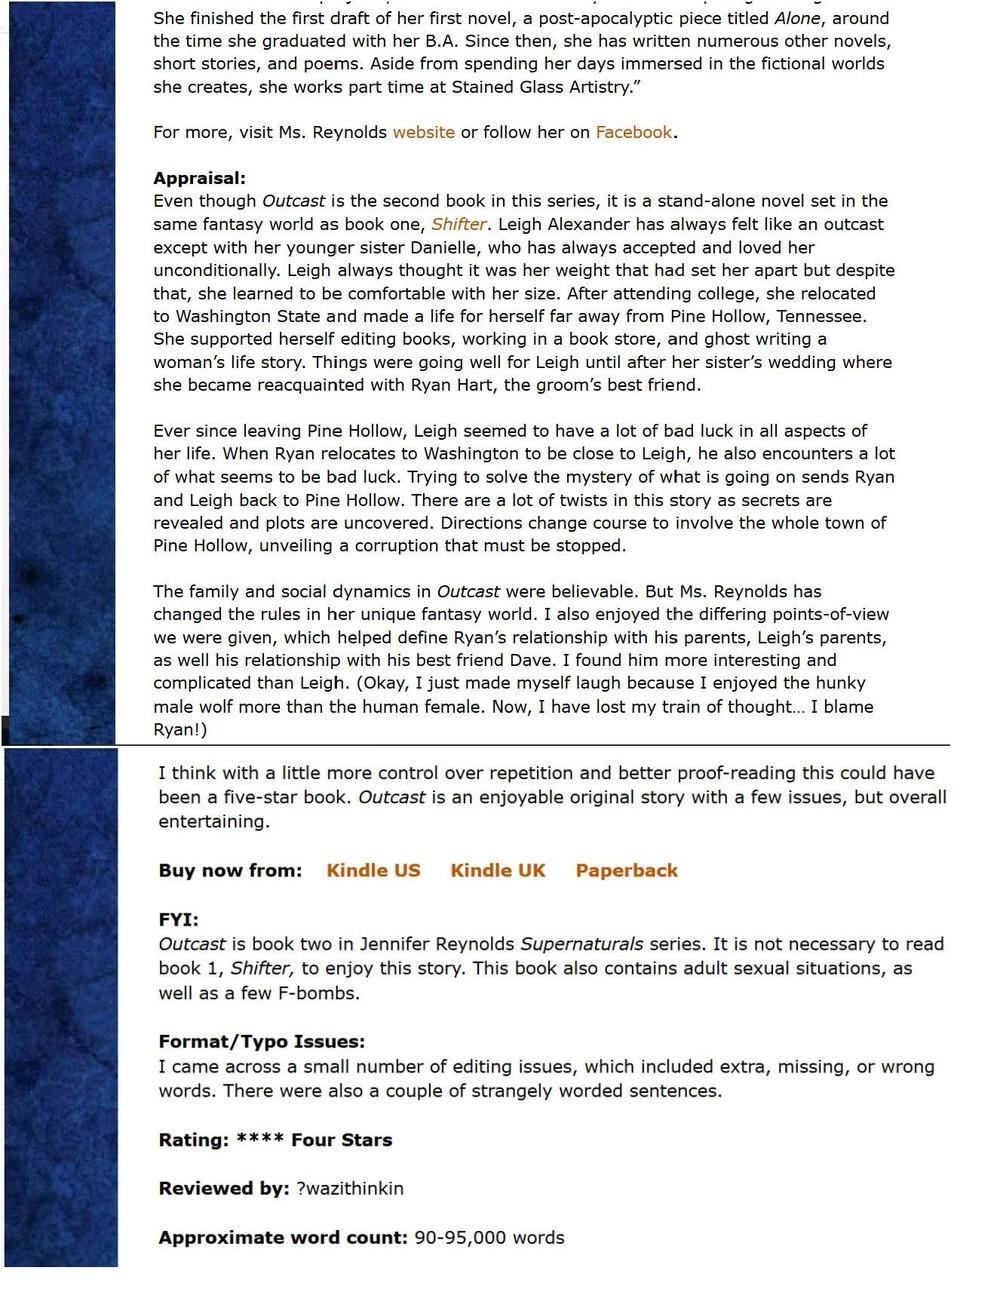 Big Al's review_Page_2.jpg